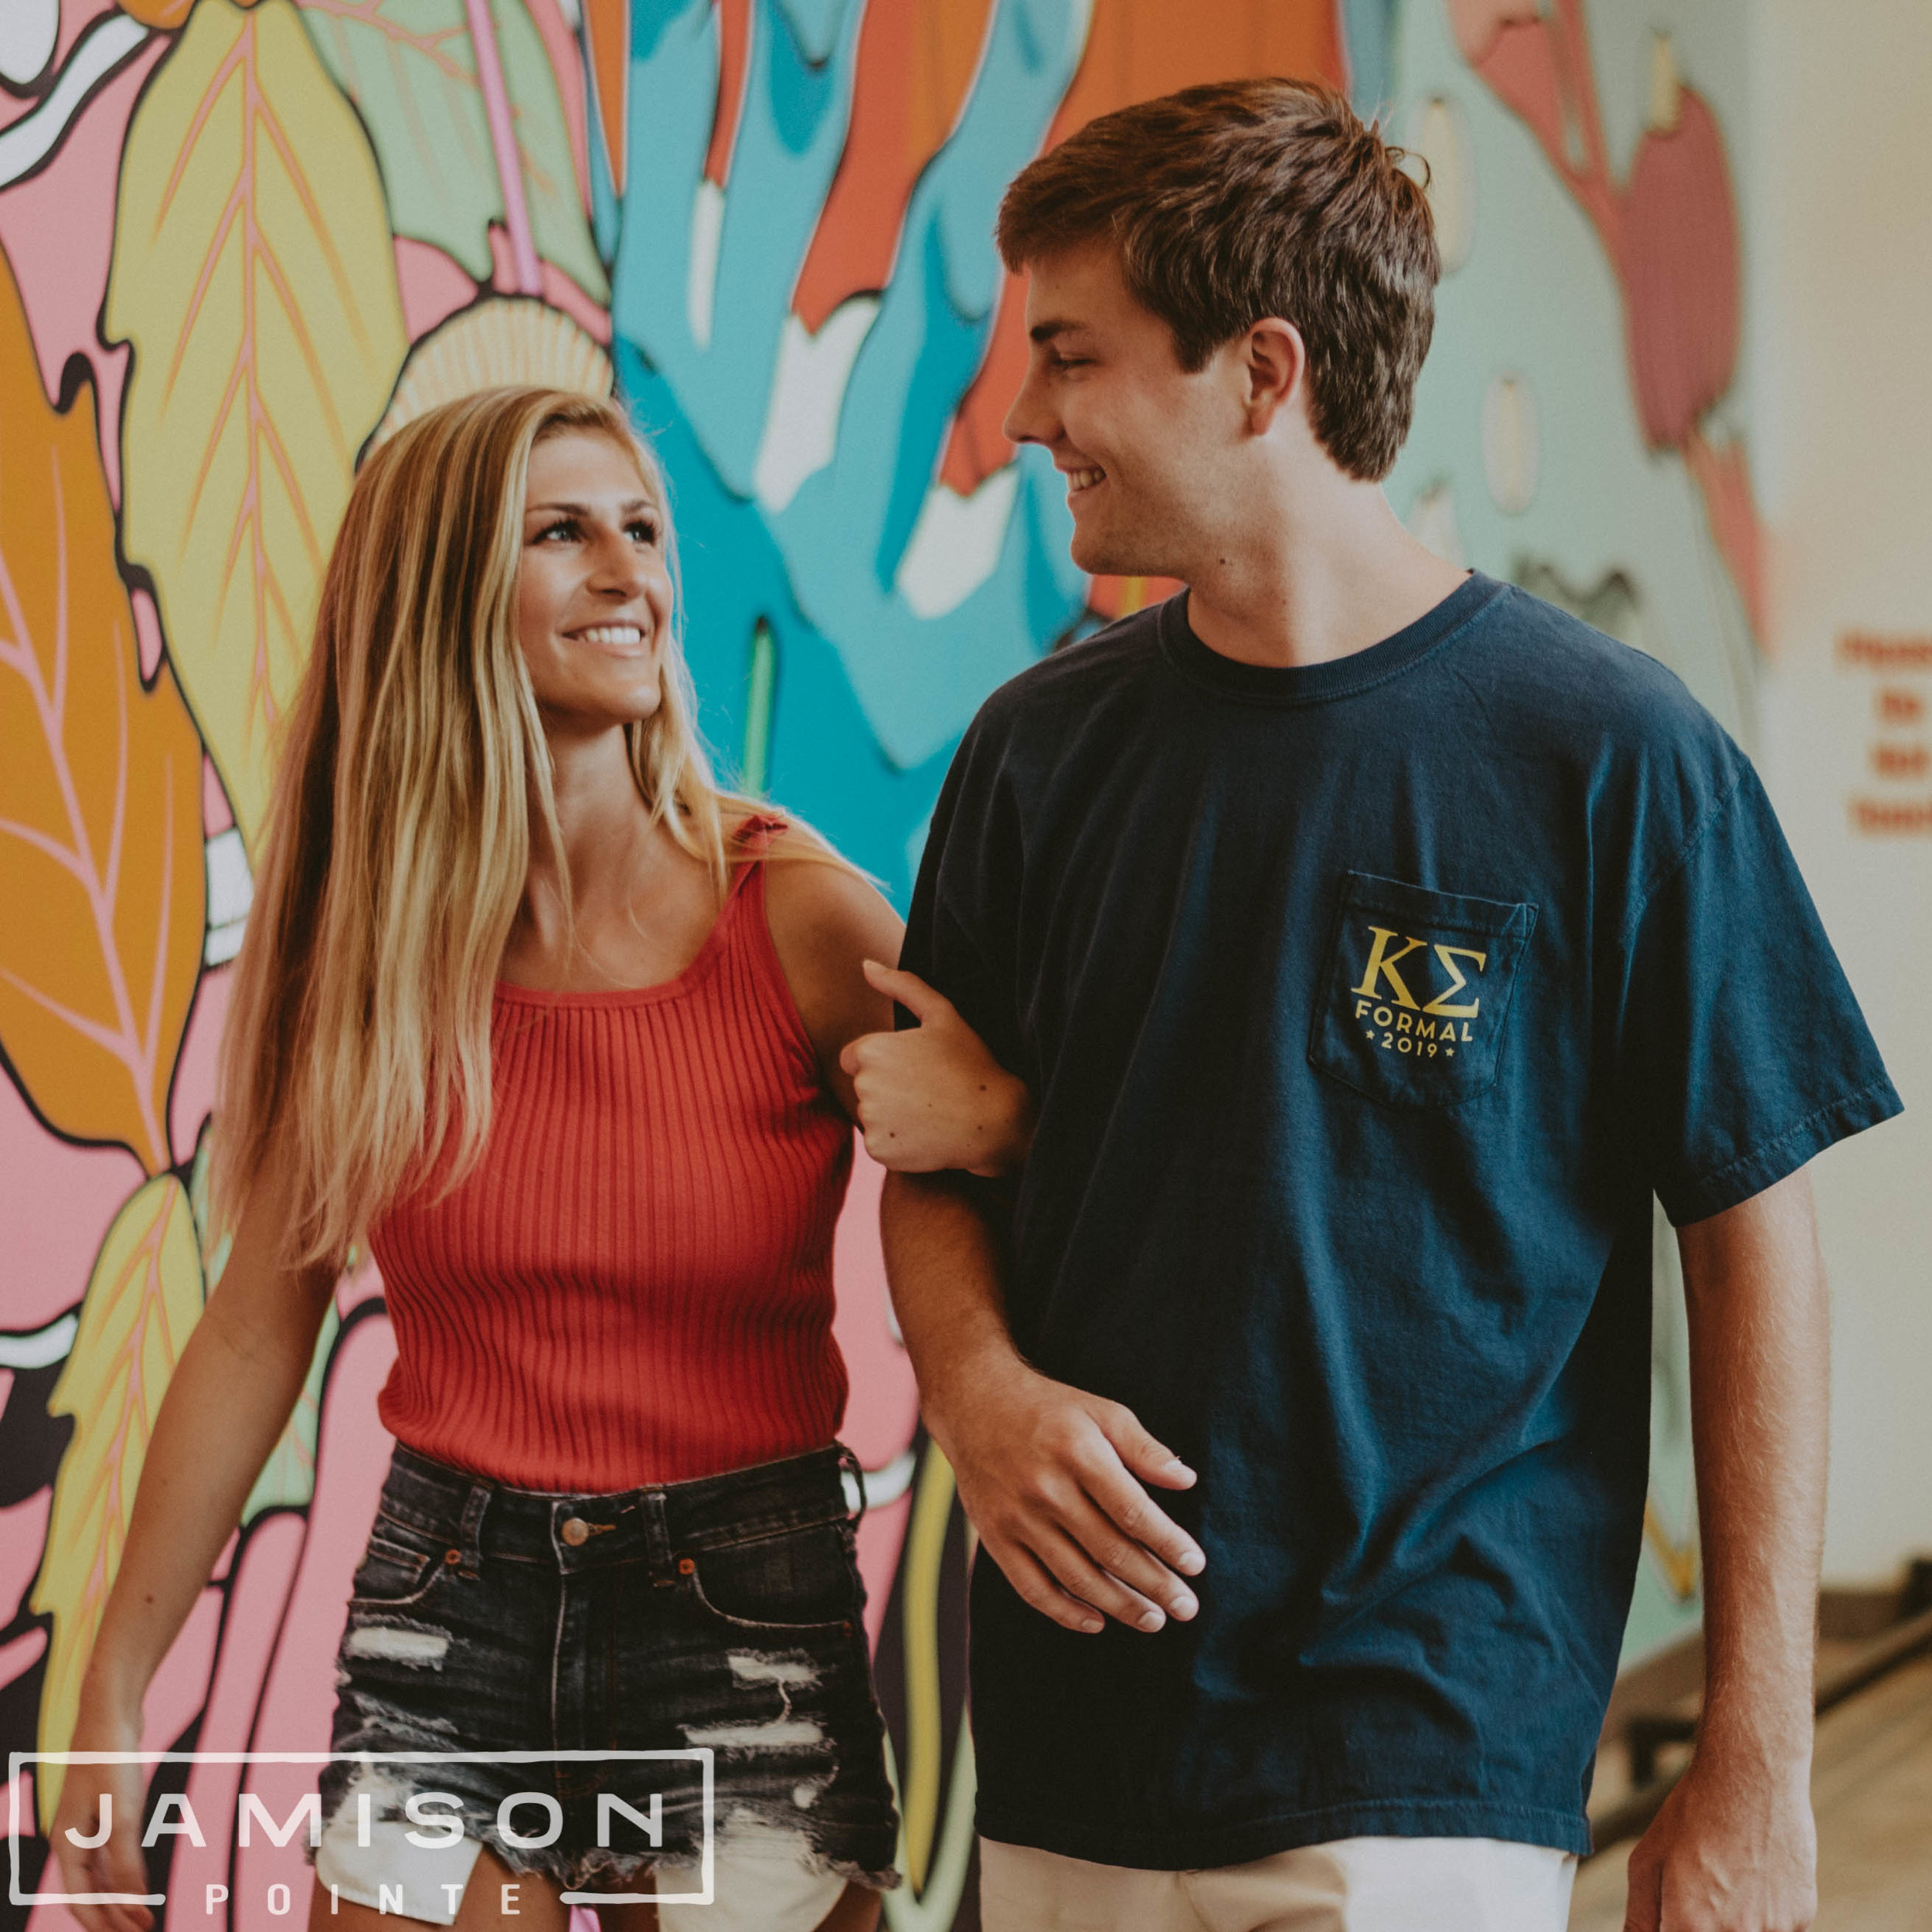 Kappa Sigma Nashville Formal Tshirt